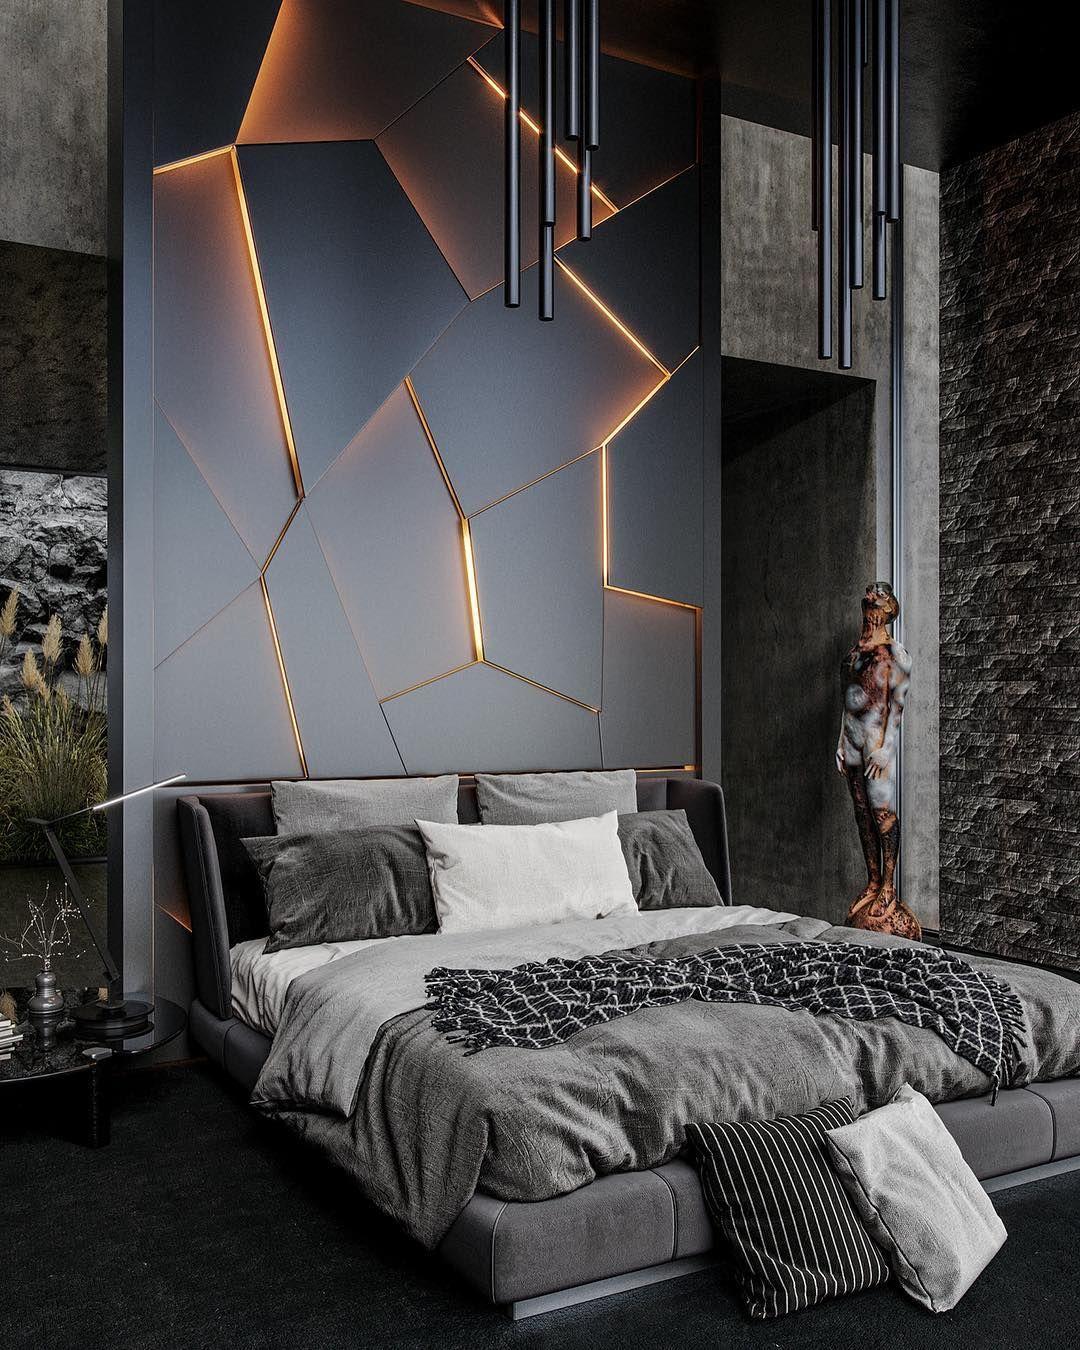 Unique Interior Design Projects Www Delightfull Eu Visit Us For Interior Design Ideas Best Luxury Bedroom Master Luxurious Bedrooms Luxury Bedroom Design